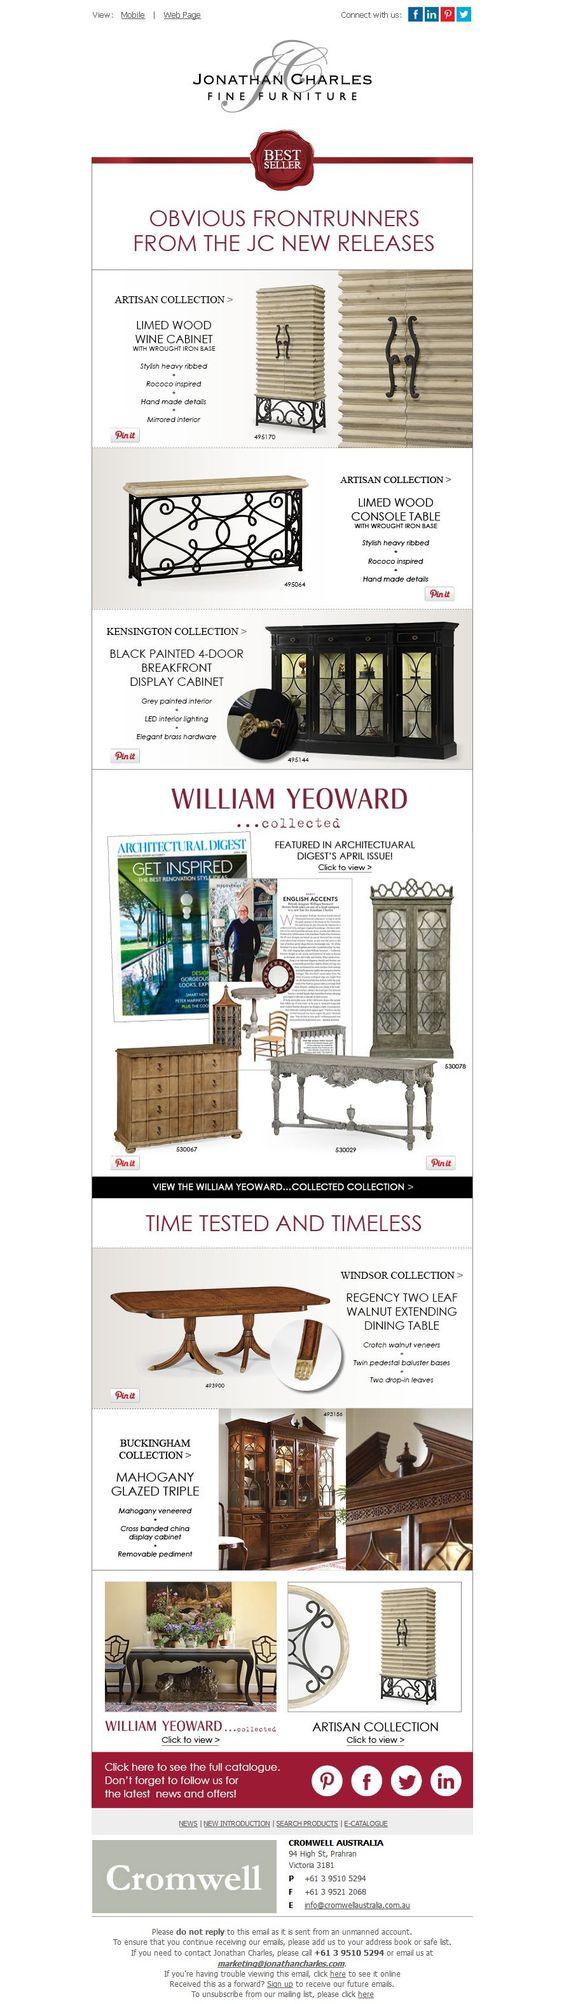 Best Seller - April 2014: Obvious Frontrunners From The JC New Releases #jcfurniture #jonathancharles #Furniture #InteriorDesign #decorex #hpmkt